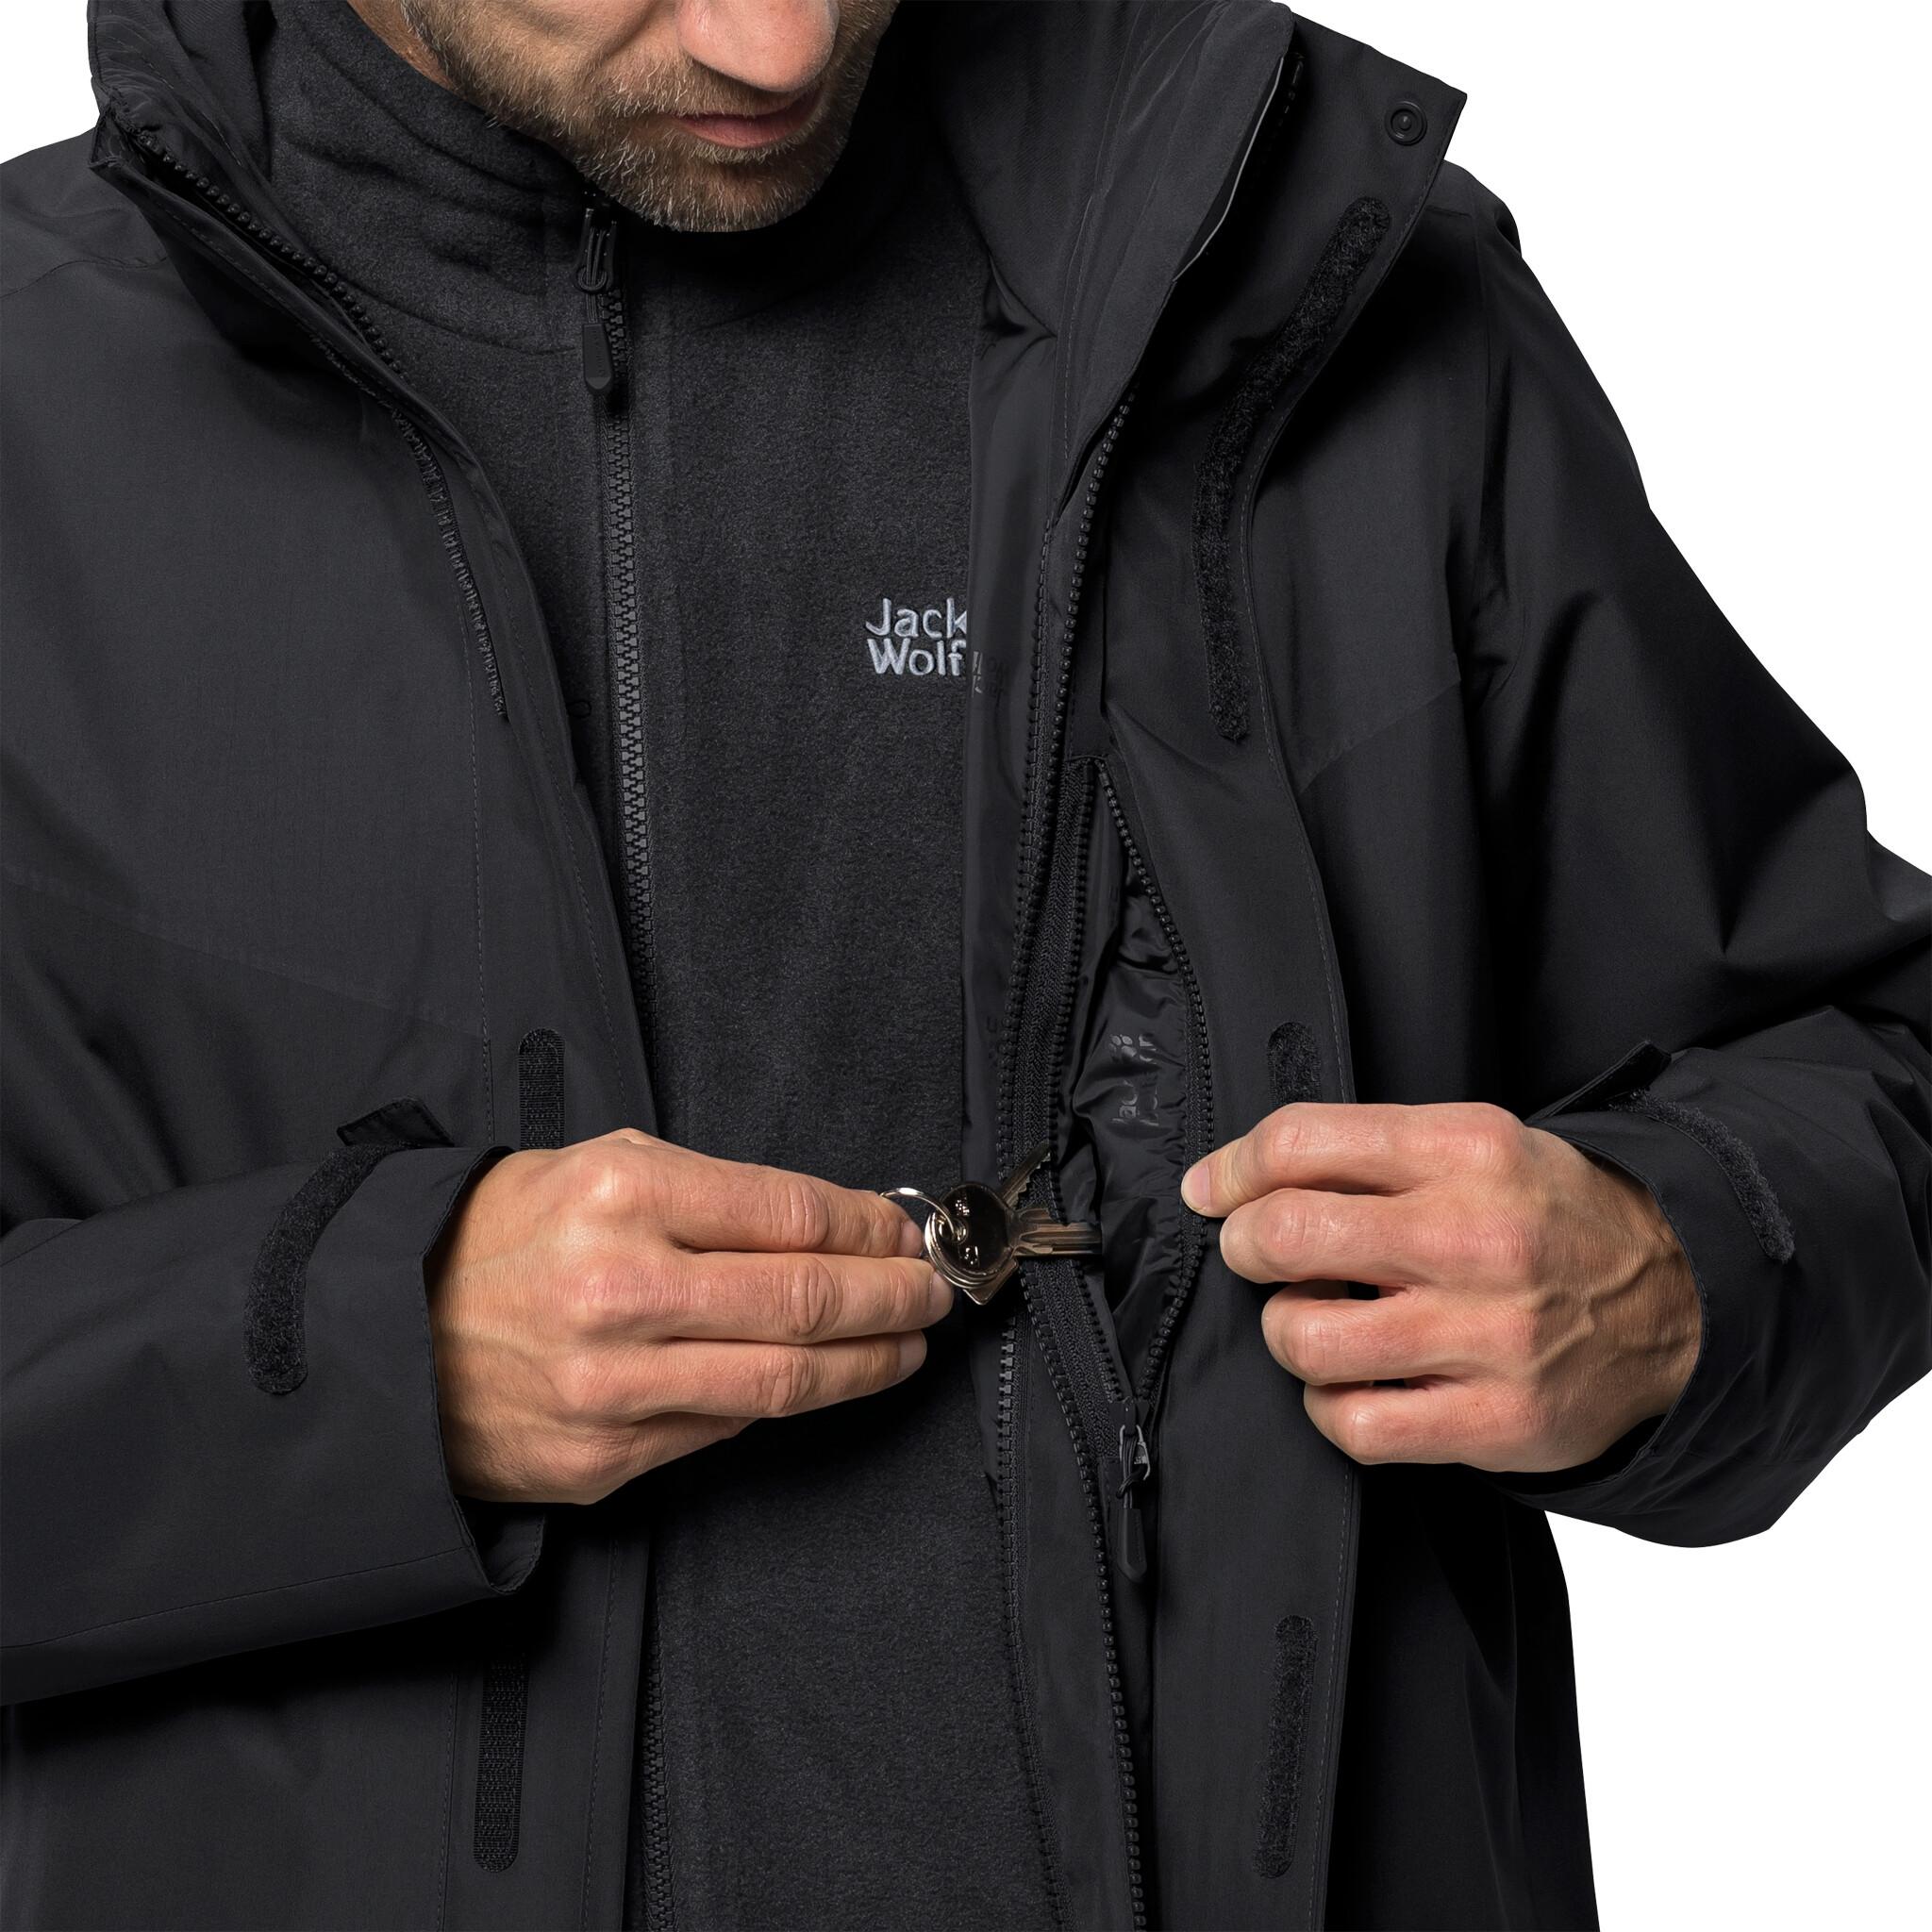 quality design 064a2 458d1 Jack Wolfskin Arland 3in1 Jacke Herren black